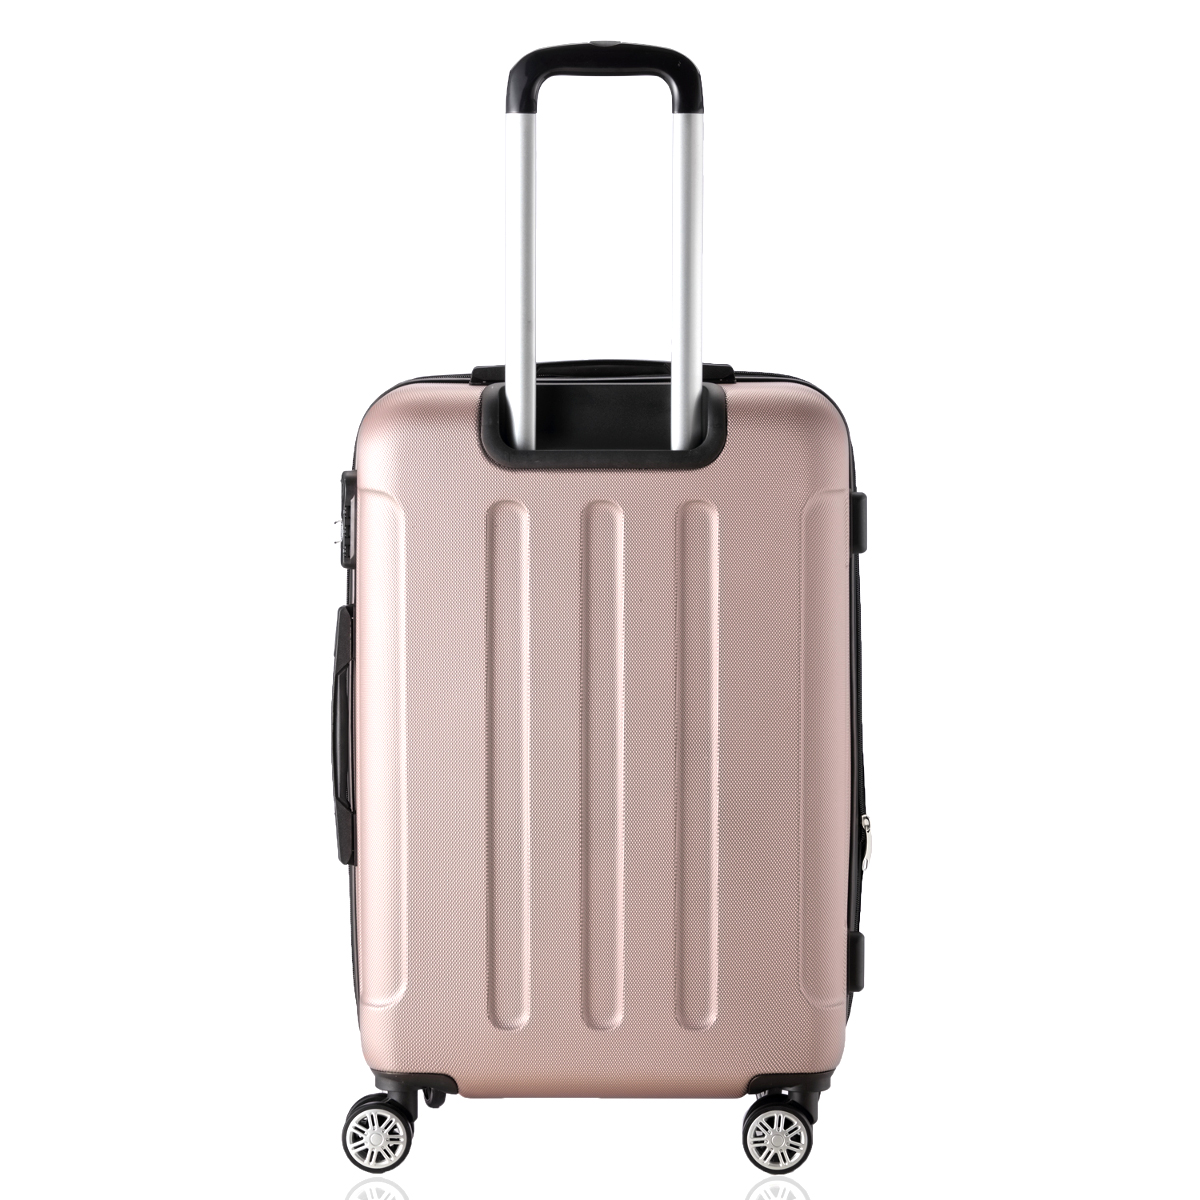 Koffer-Flexot-2045-Hartschalenkoffer-Trolley-Kofferset-Reisekoffer-M-L-XL-Set Indexbild 96